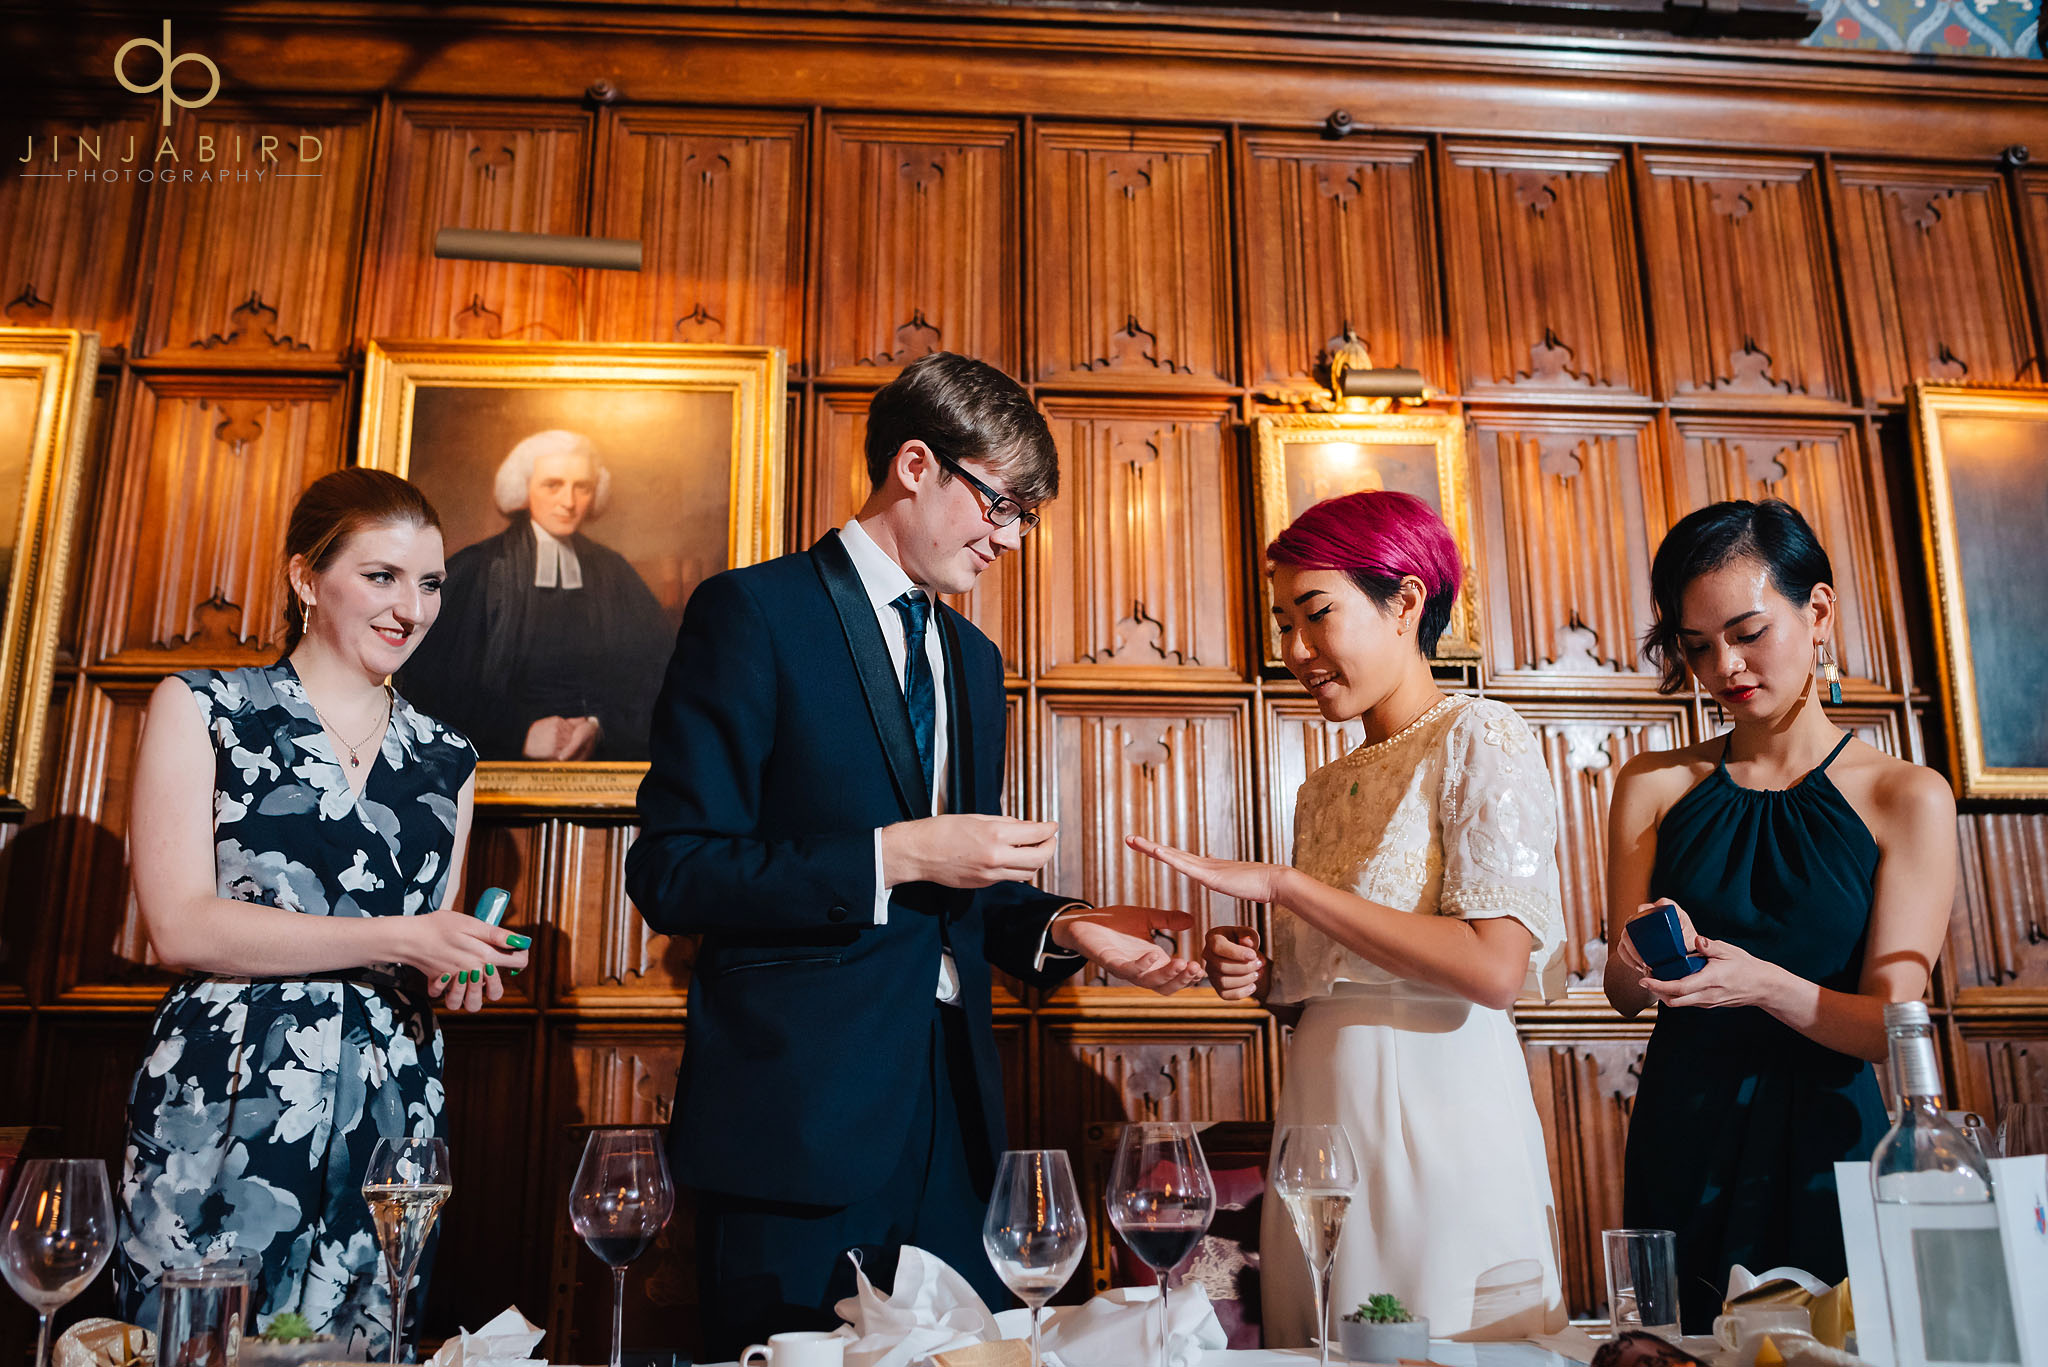 exchange-wedding-rings-corpus-christi-college